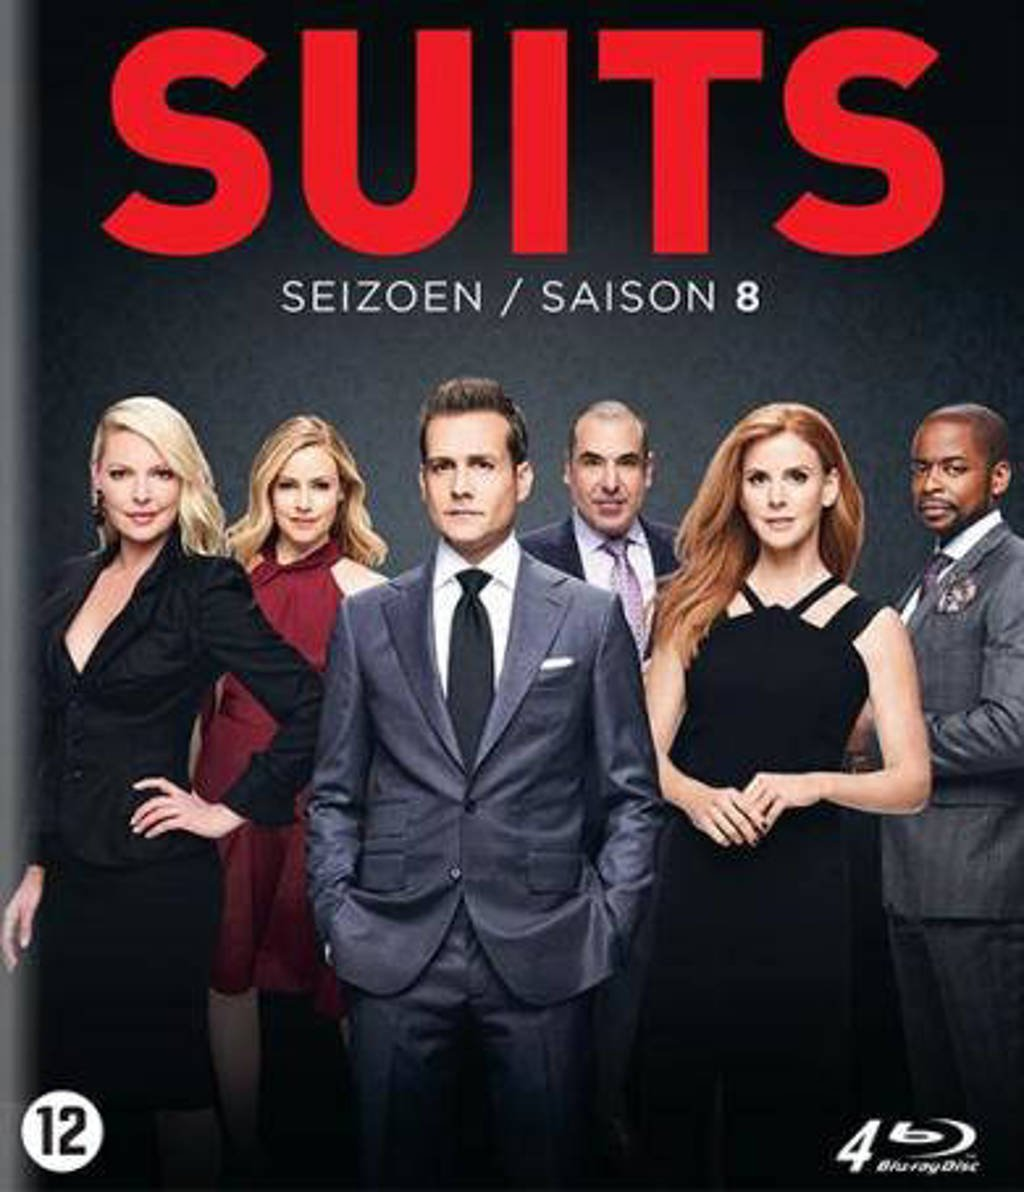 Suits - Seizoen 8 (Blu-ray)